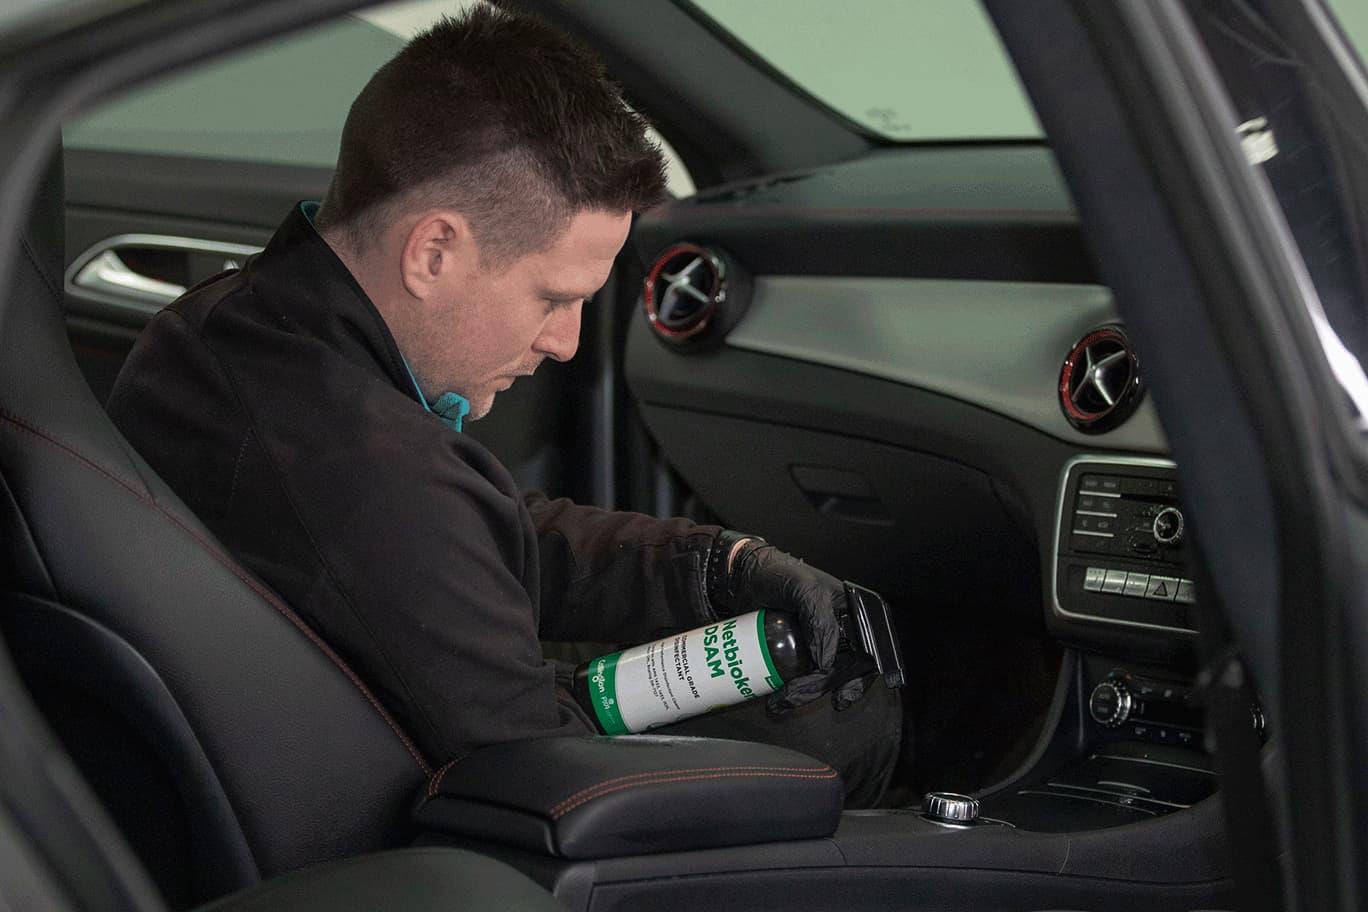 car sanitisation netbiokem coronavirus